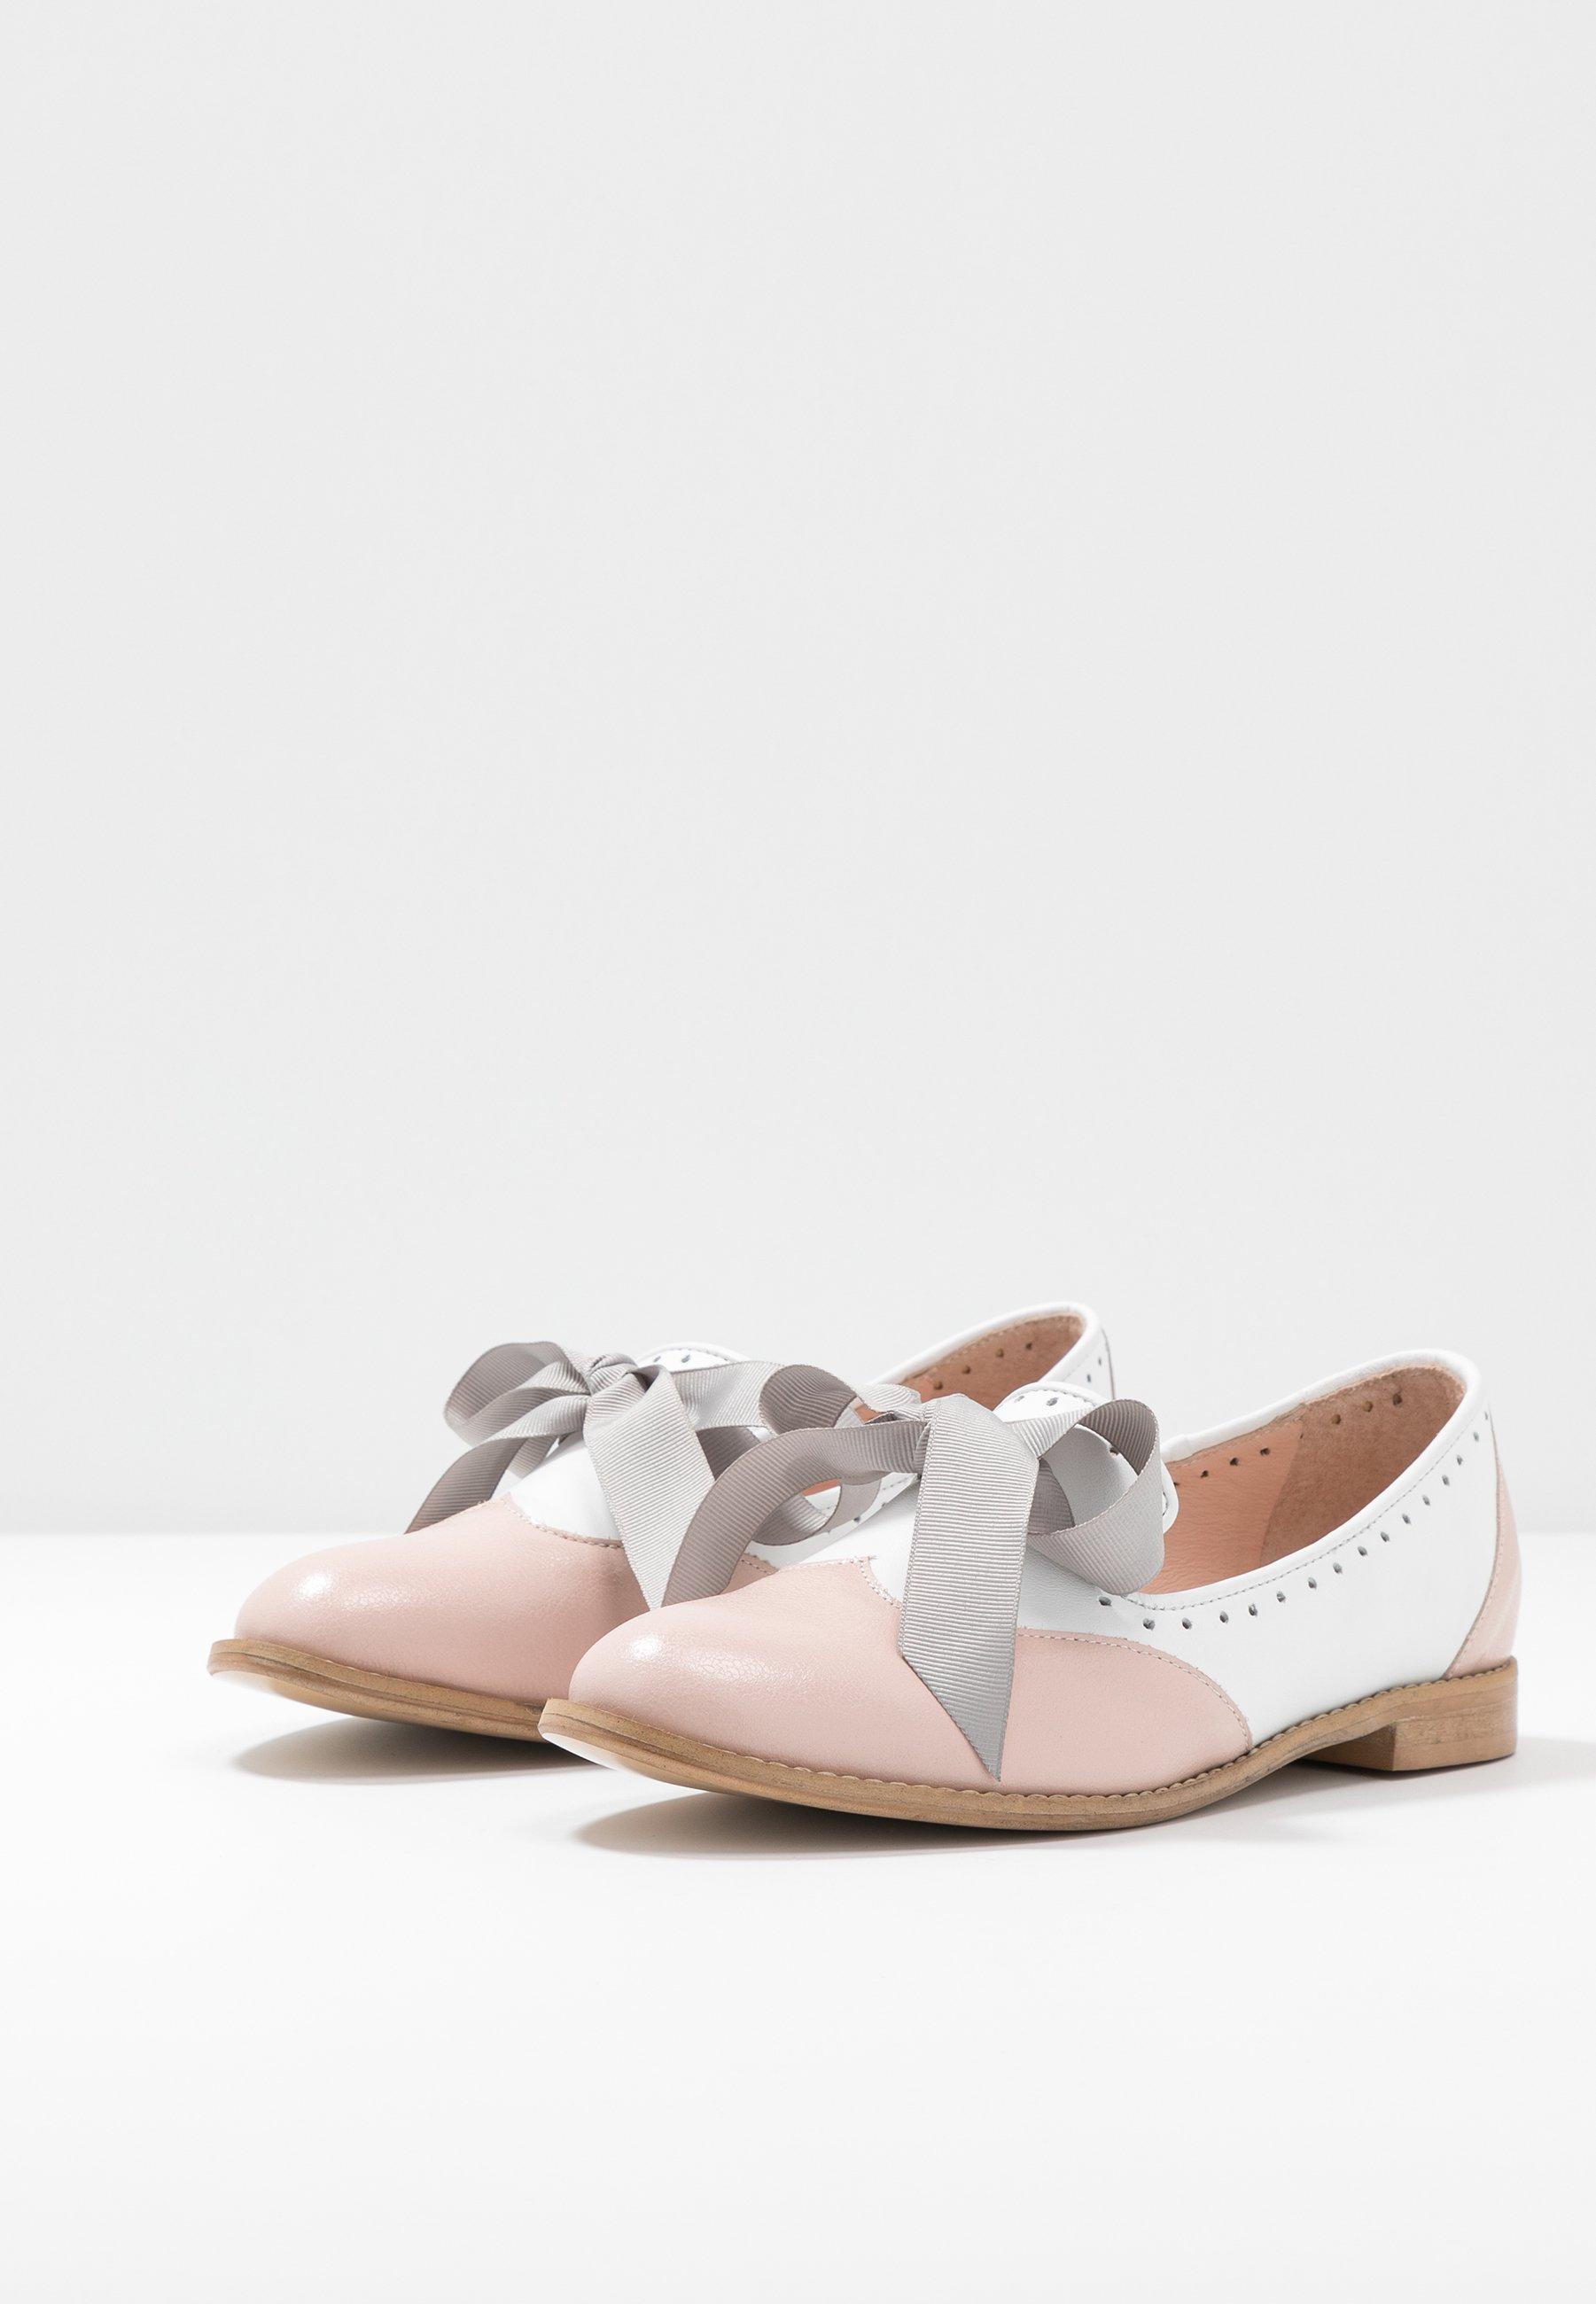 L37 Mouse World - Slip-ins Pink/white